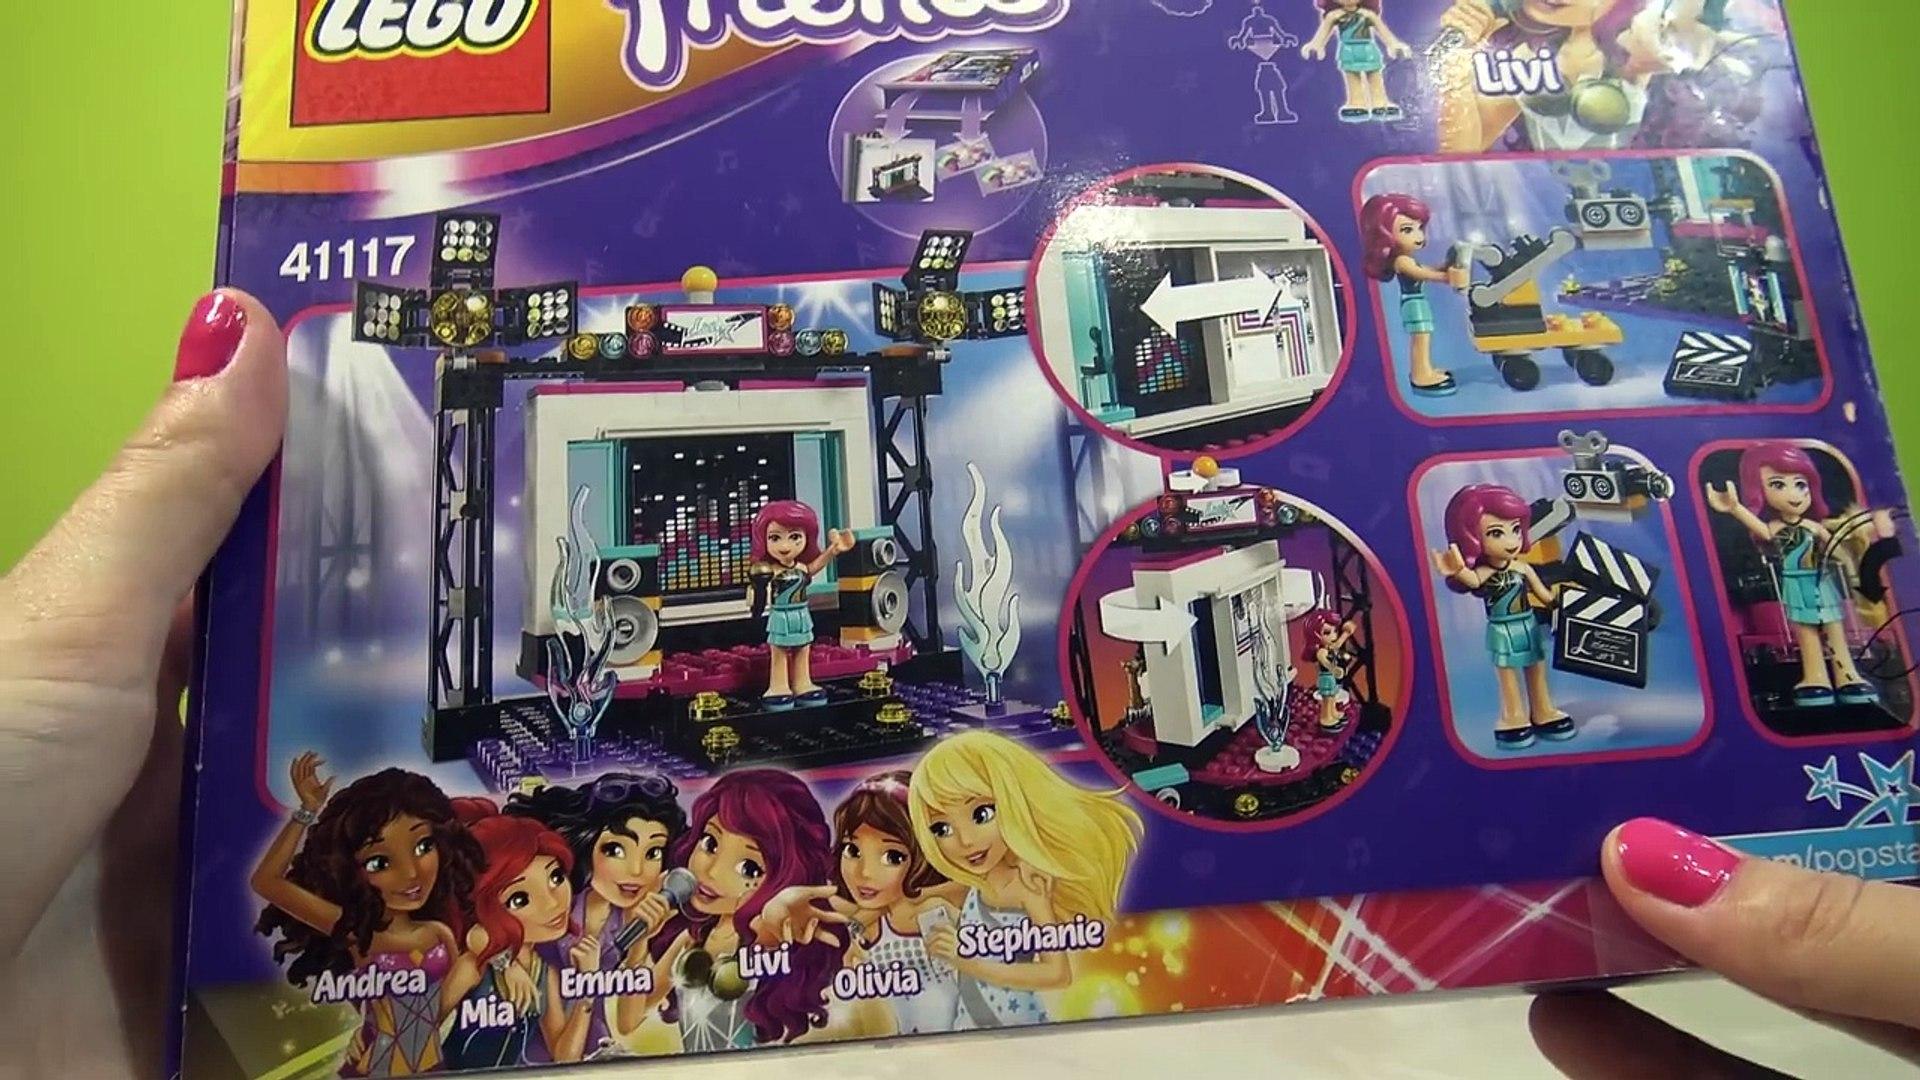 ЛЕГО Френдс Поп-звезда телестудия   LEGO Friends Pop Star TV Studio